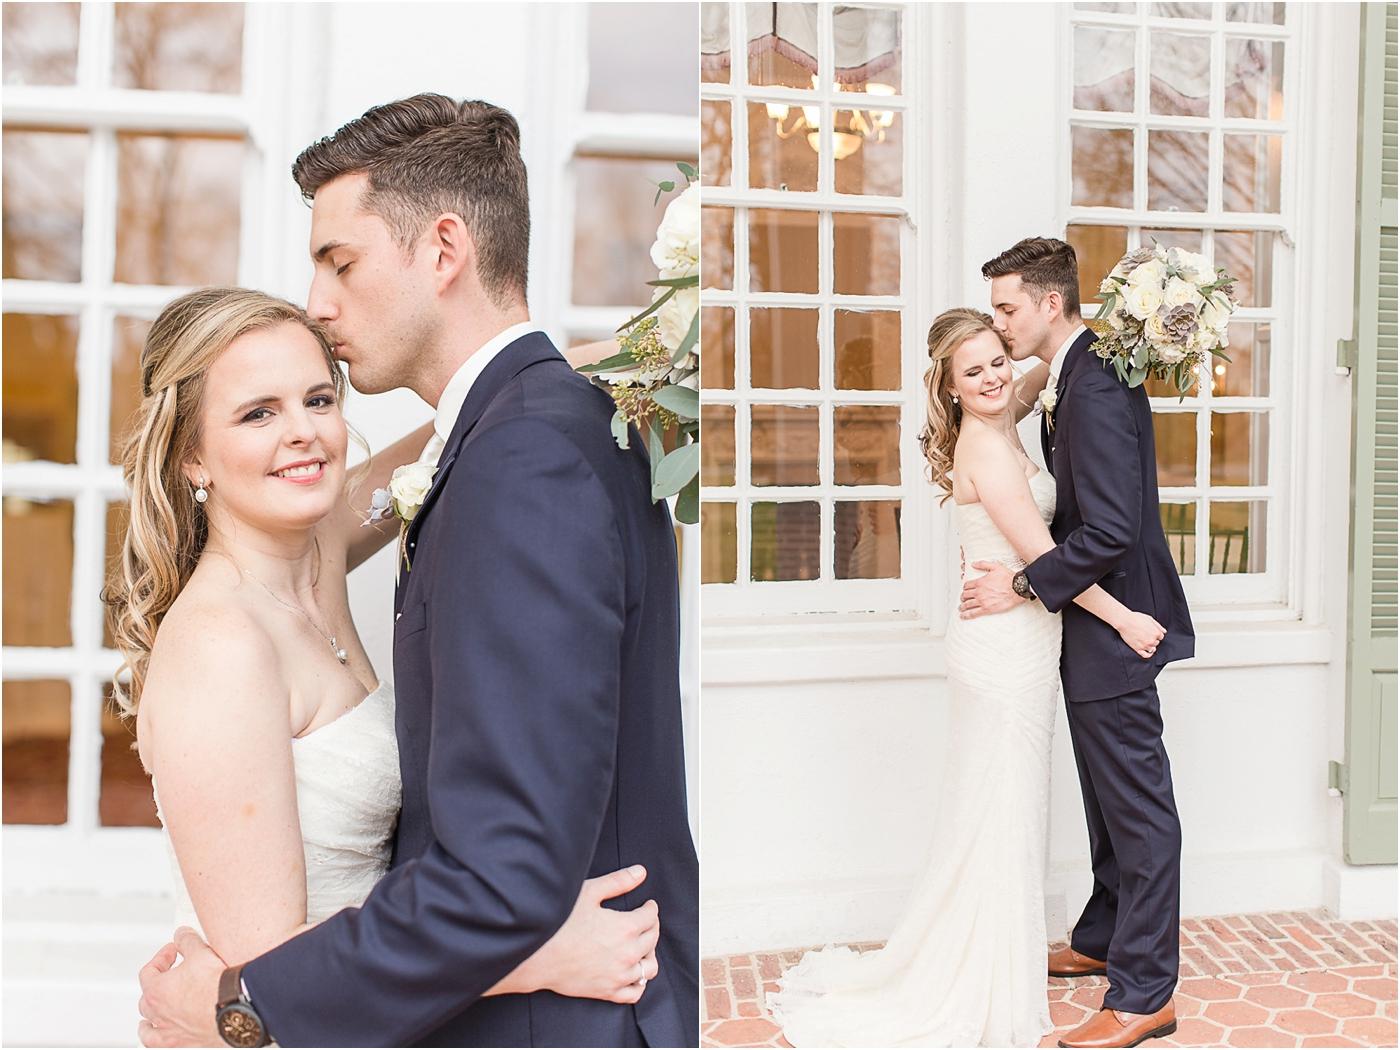 Greyrock-mansion-wedding-55.jpg